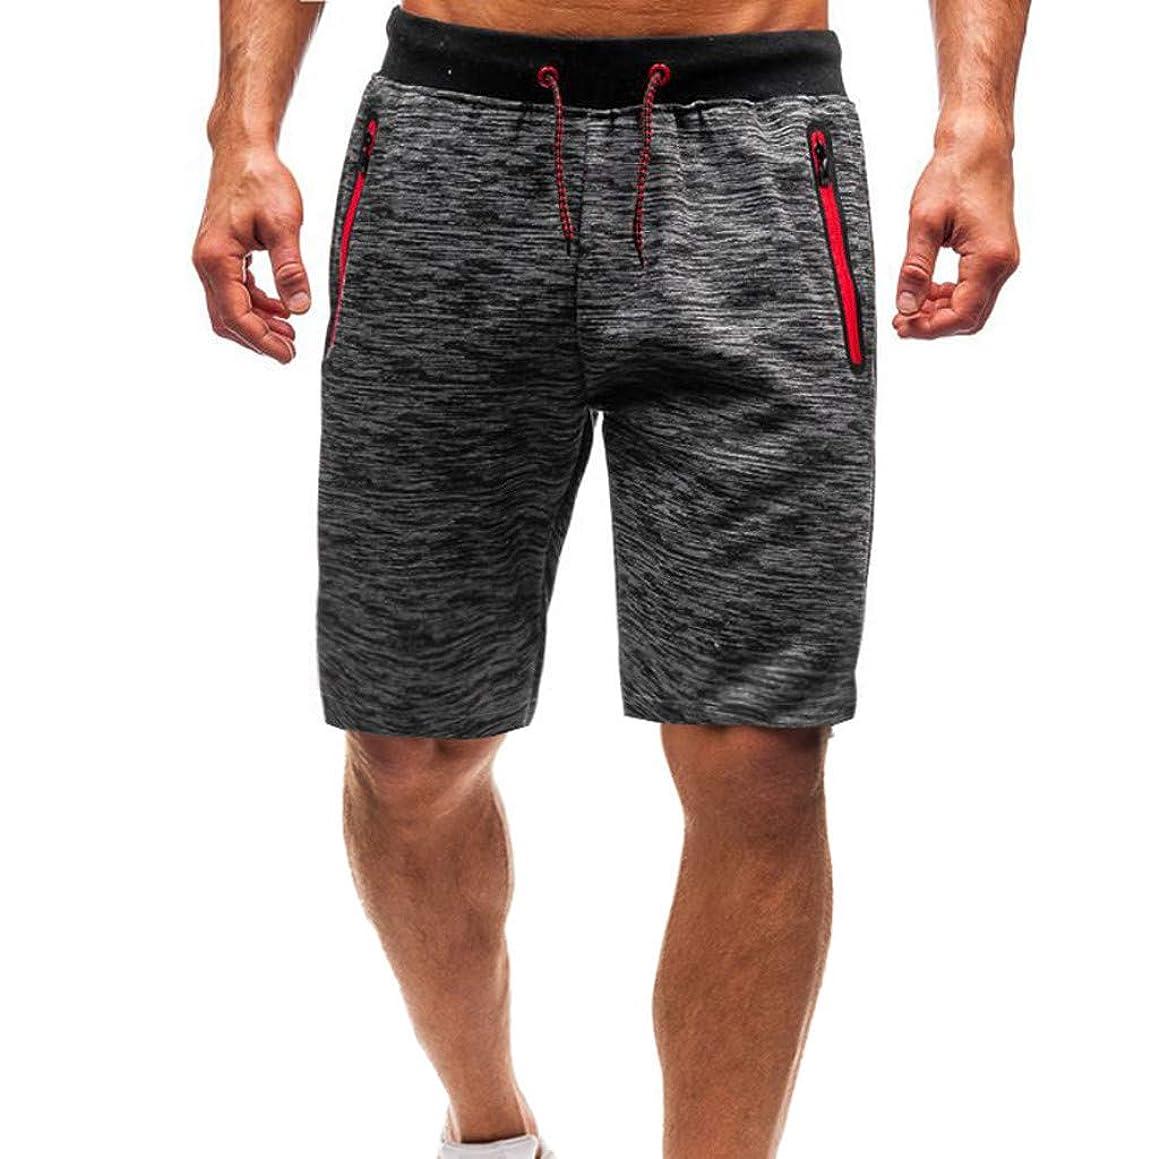 Summer Elastic Pants for Men, Huazi2 Loose Tether Shorts Yoga Sweatpants